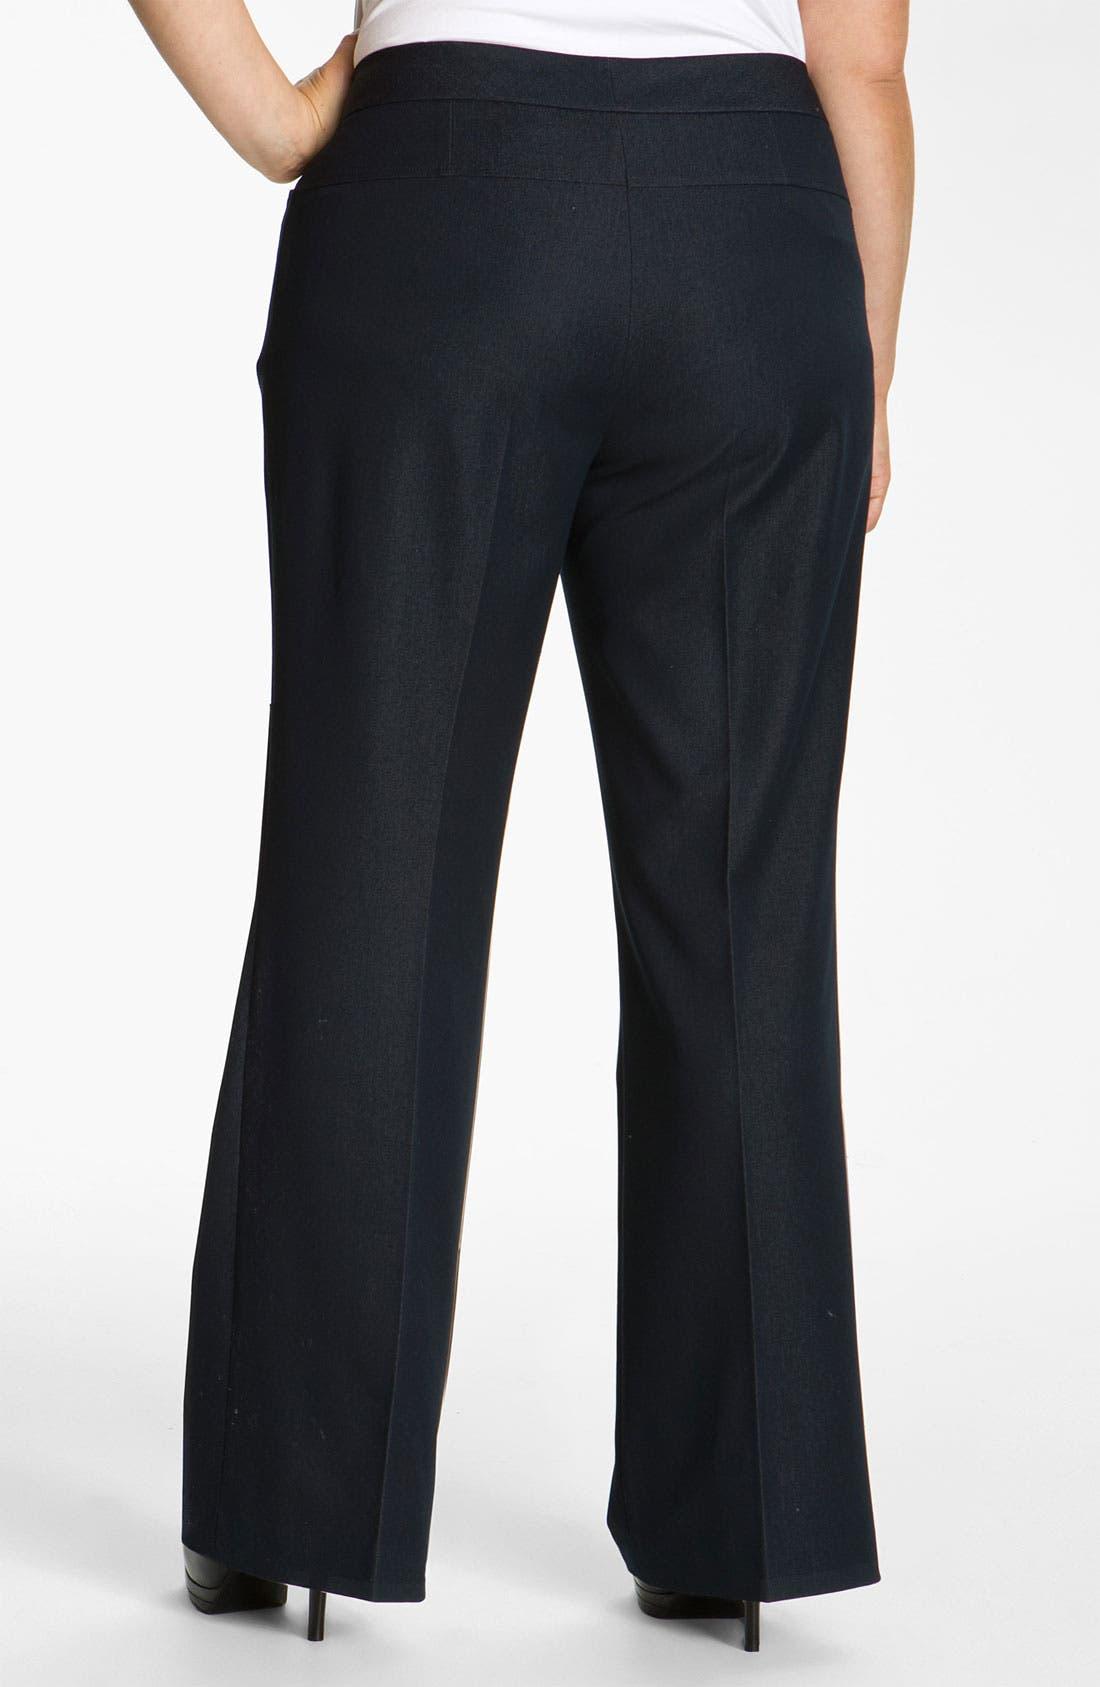 Alternate Image 2  - Tahari Woman 'Wesley' Trousers (Plus)